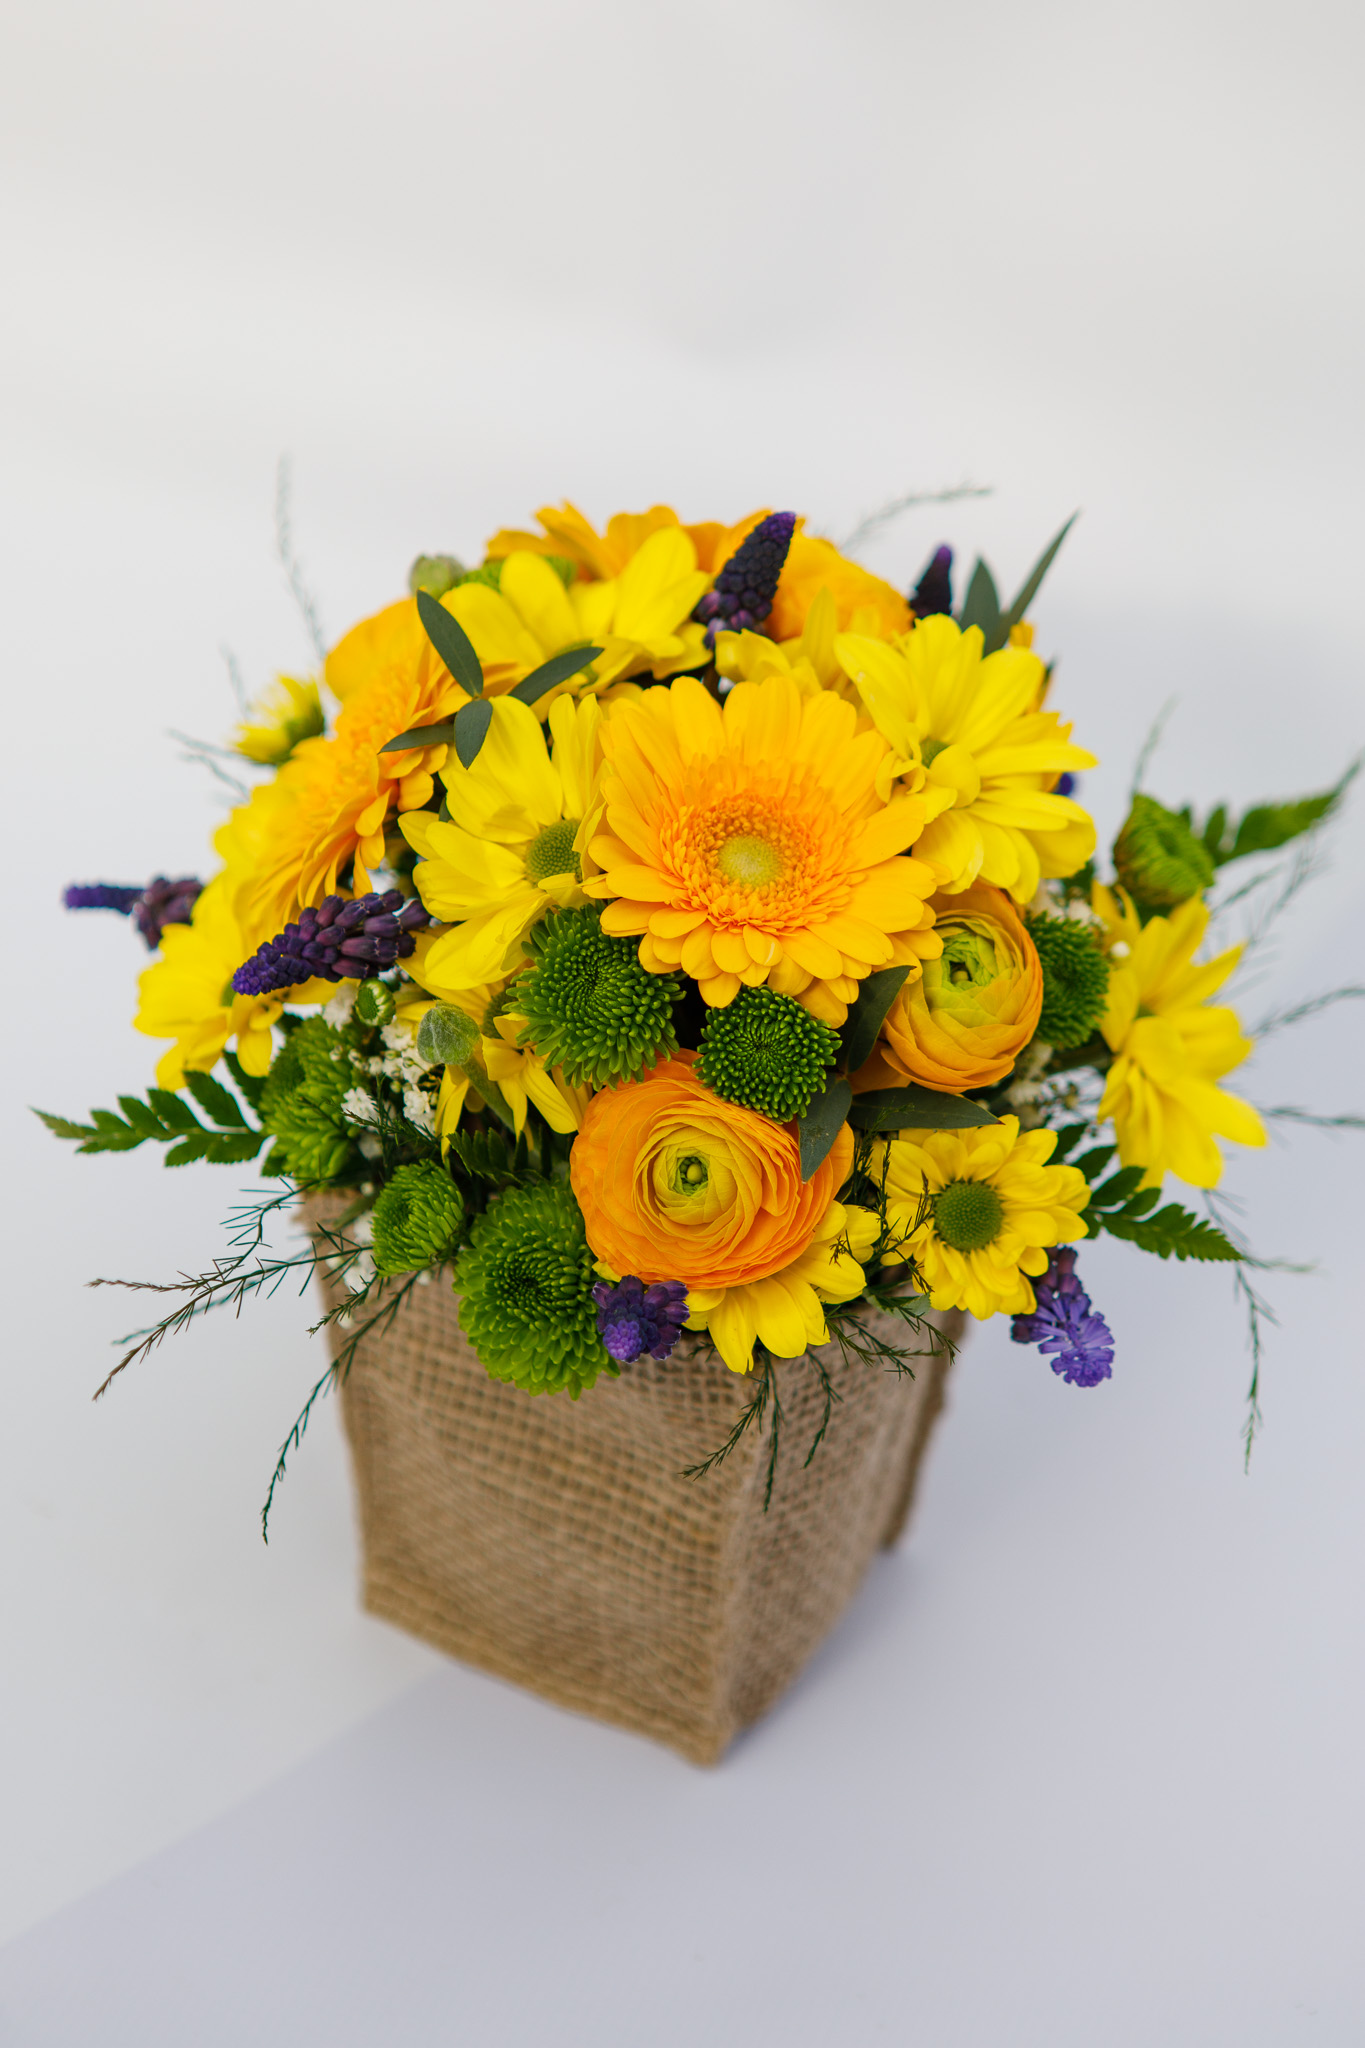 Kuldne maahommik jardin lilled for Jardin lilled